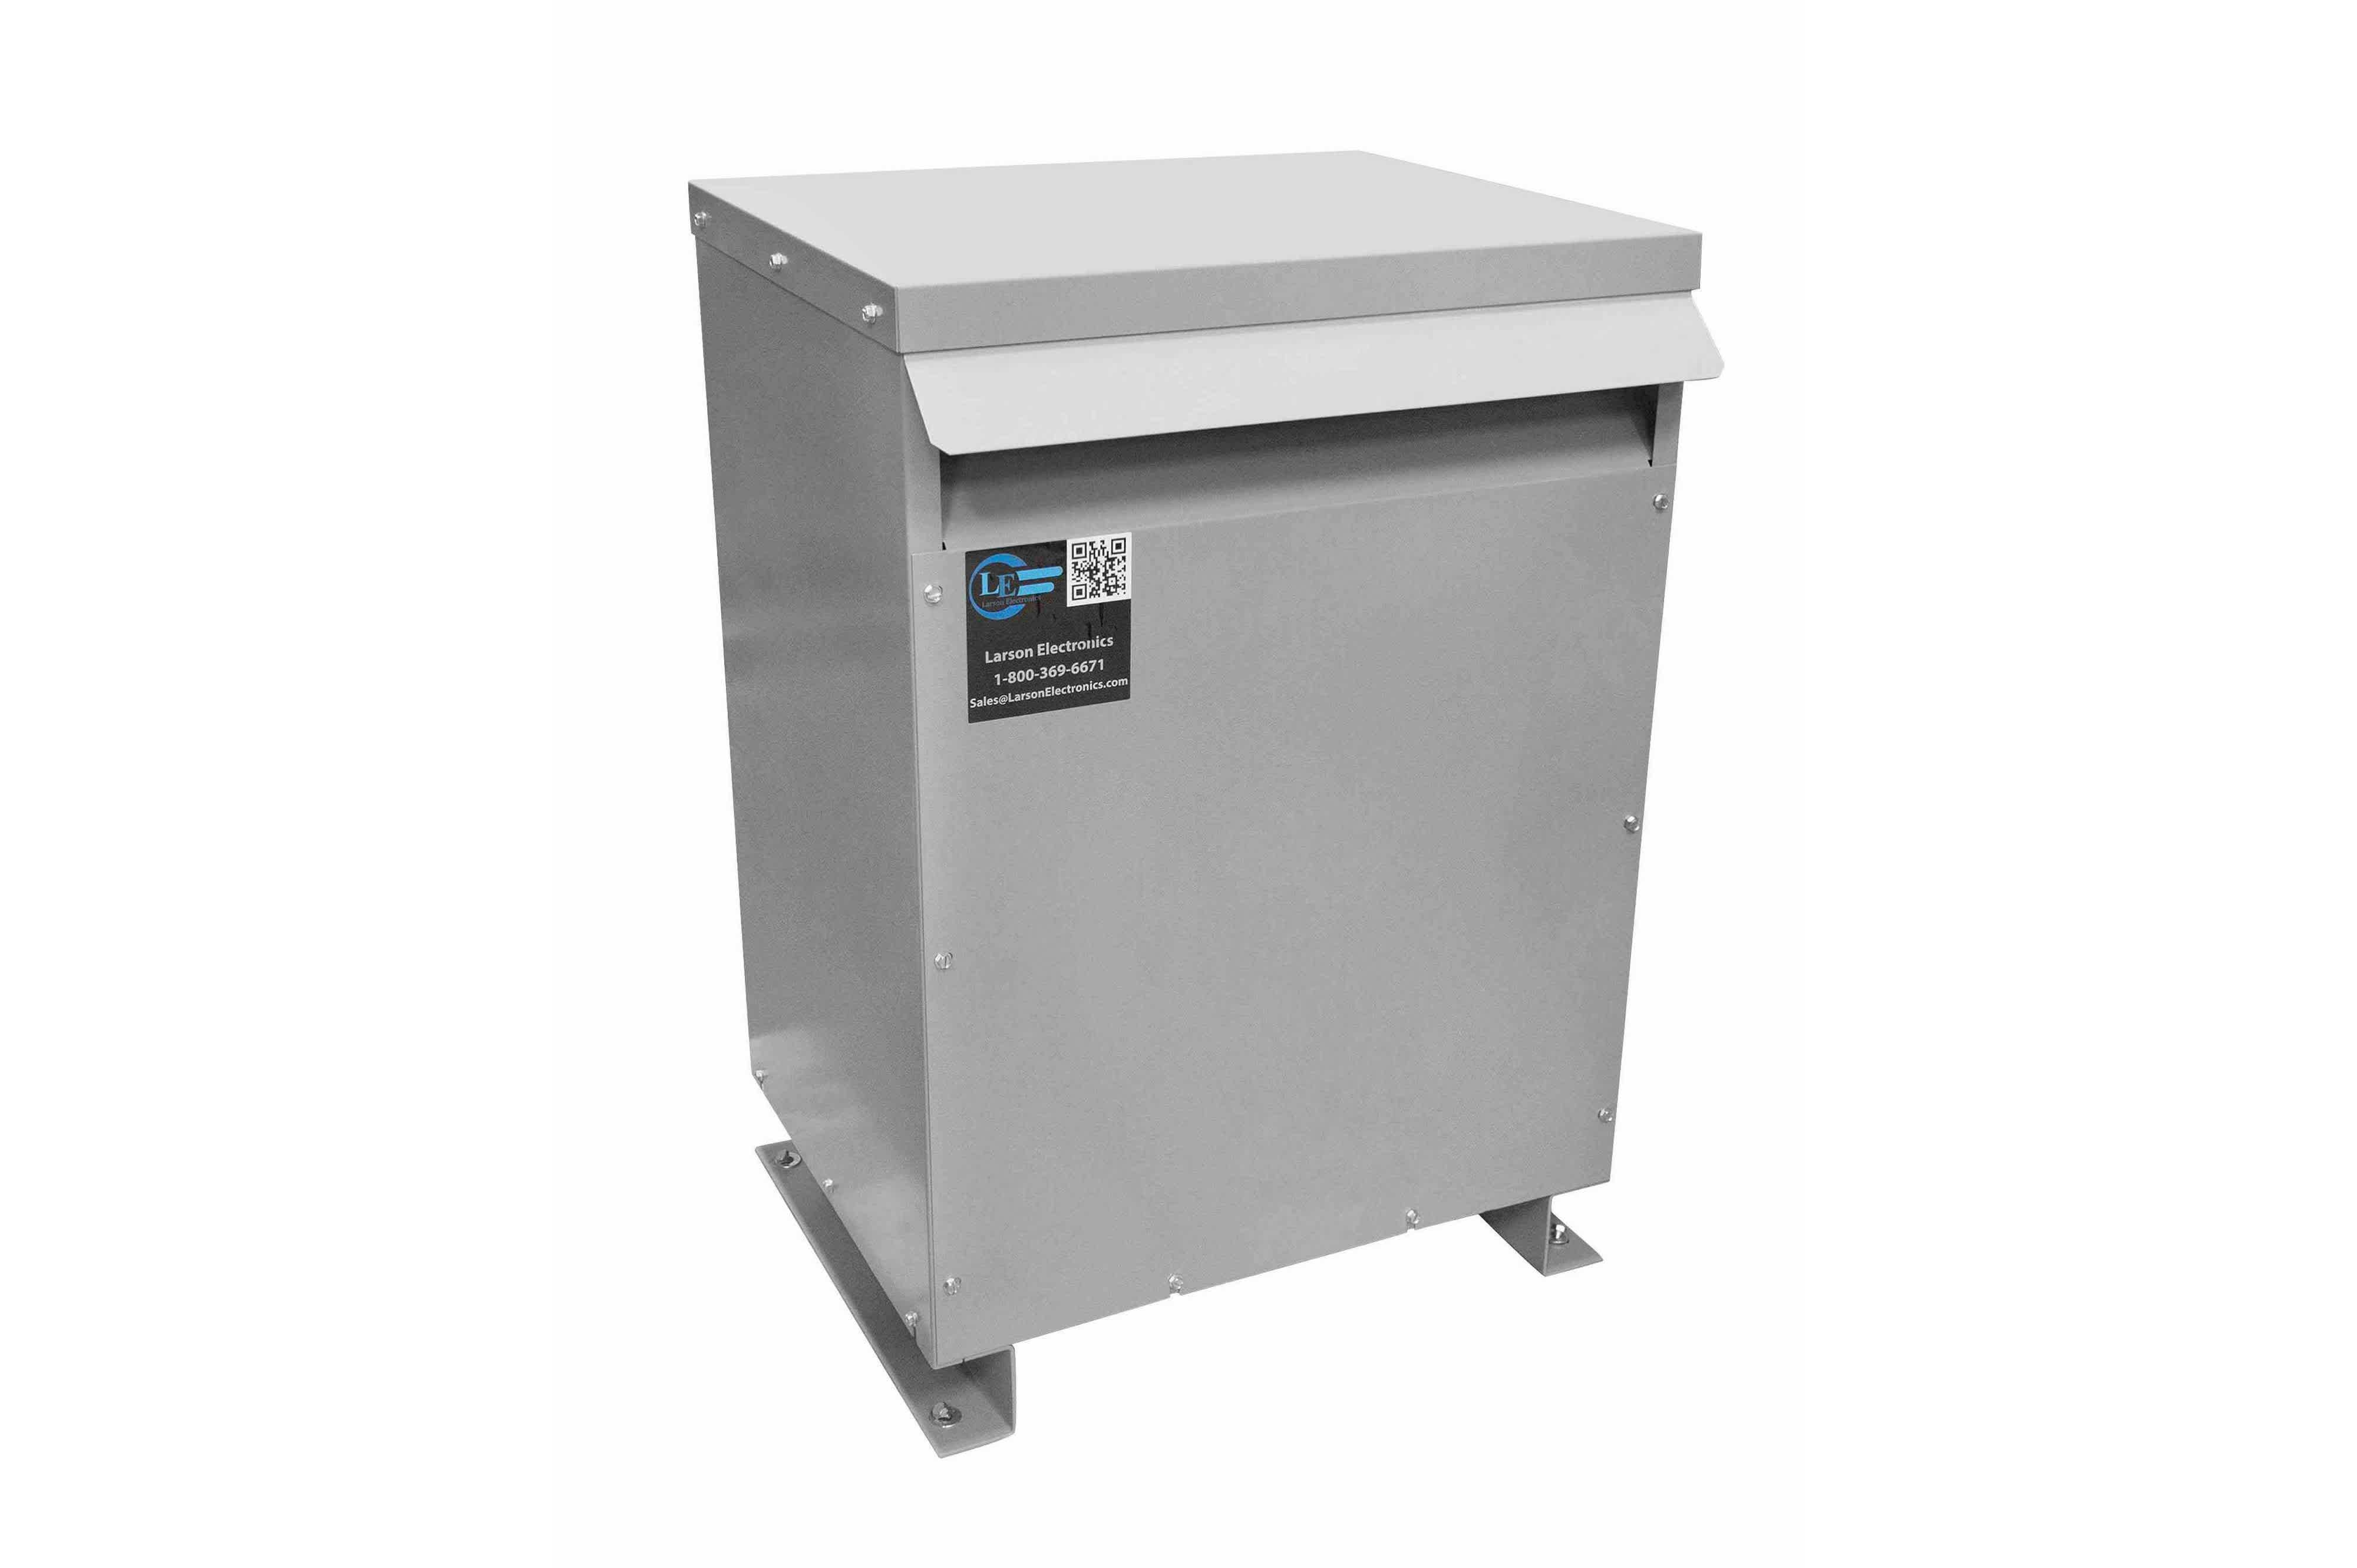 110 kVA 3PH Isolation Transformer, 600V Wye Primary, 460V Delta Secondary, N3R, Ventilated, 60 Hz